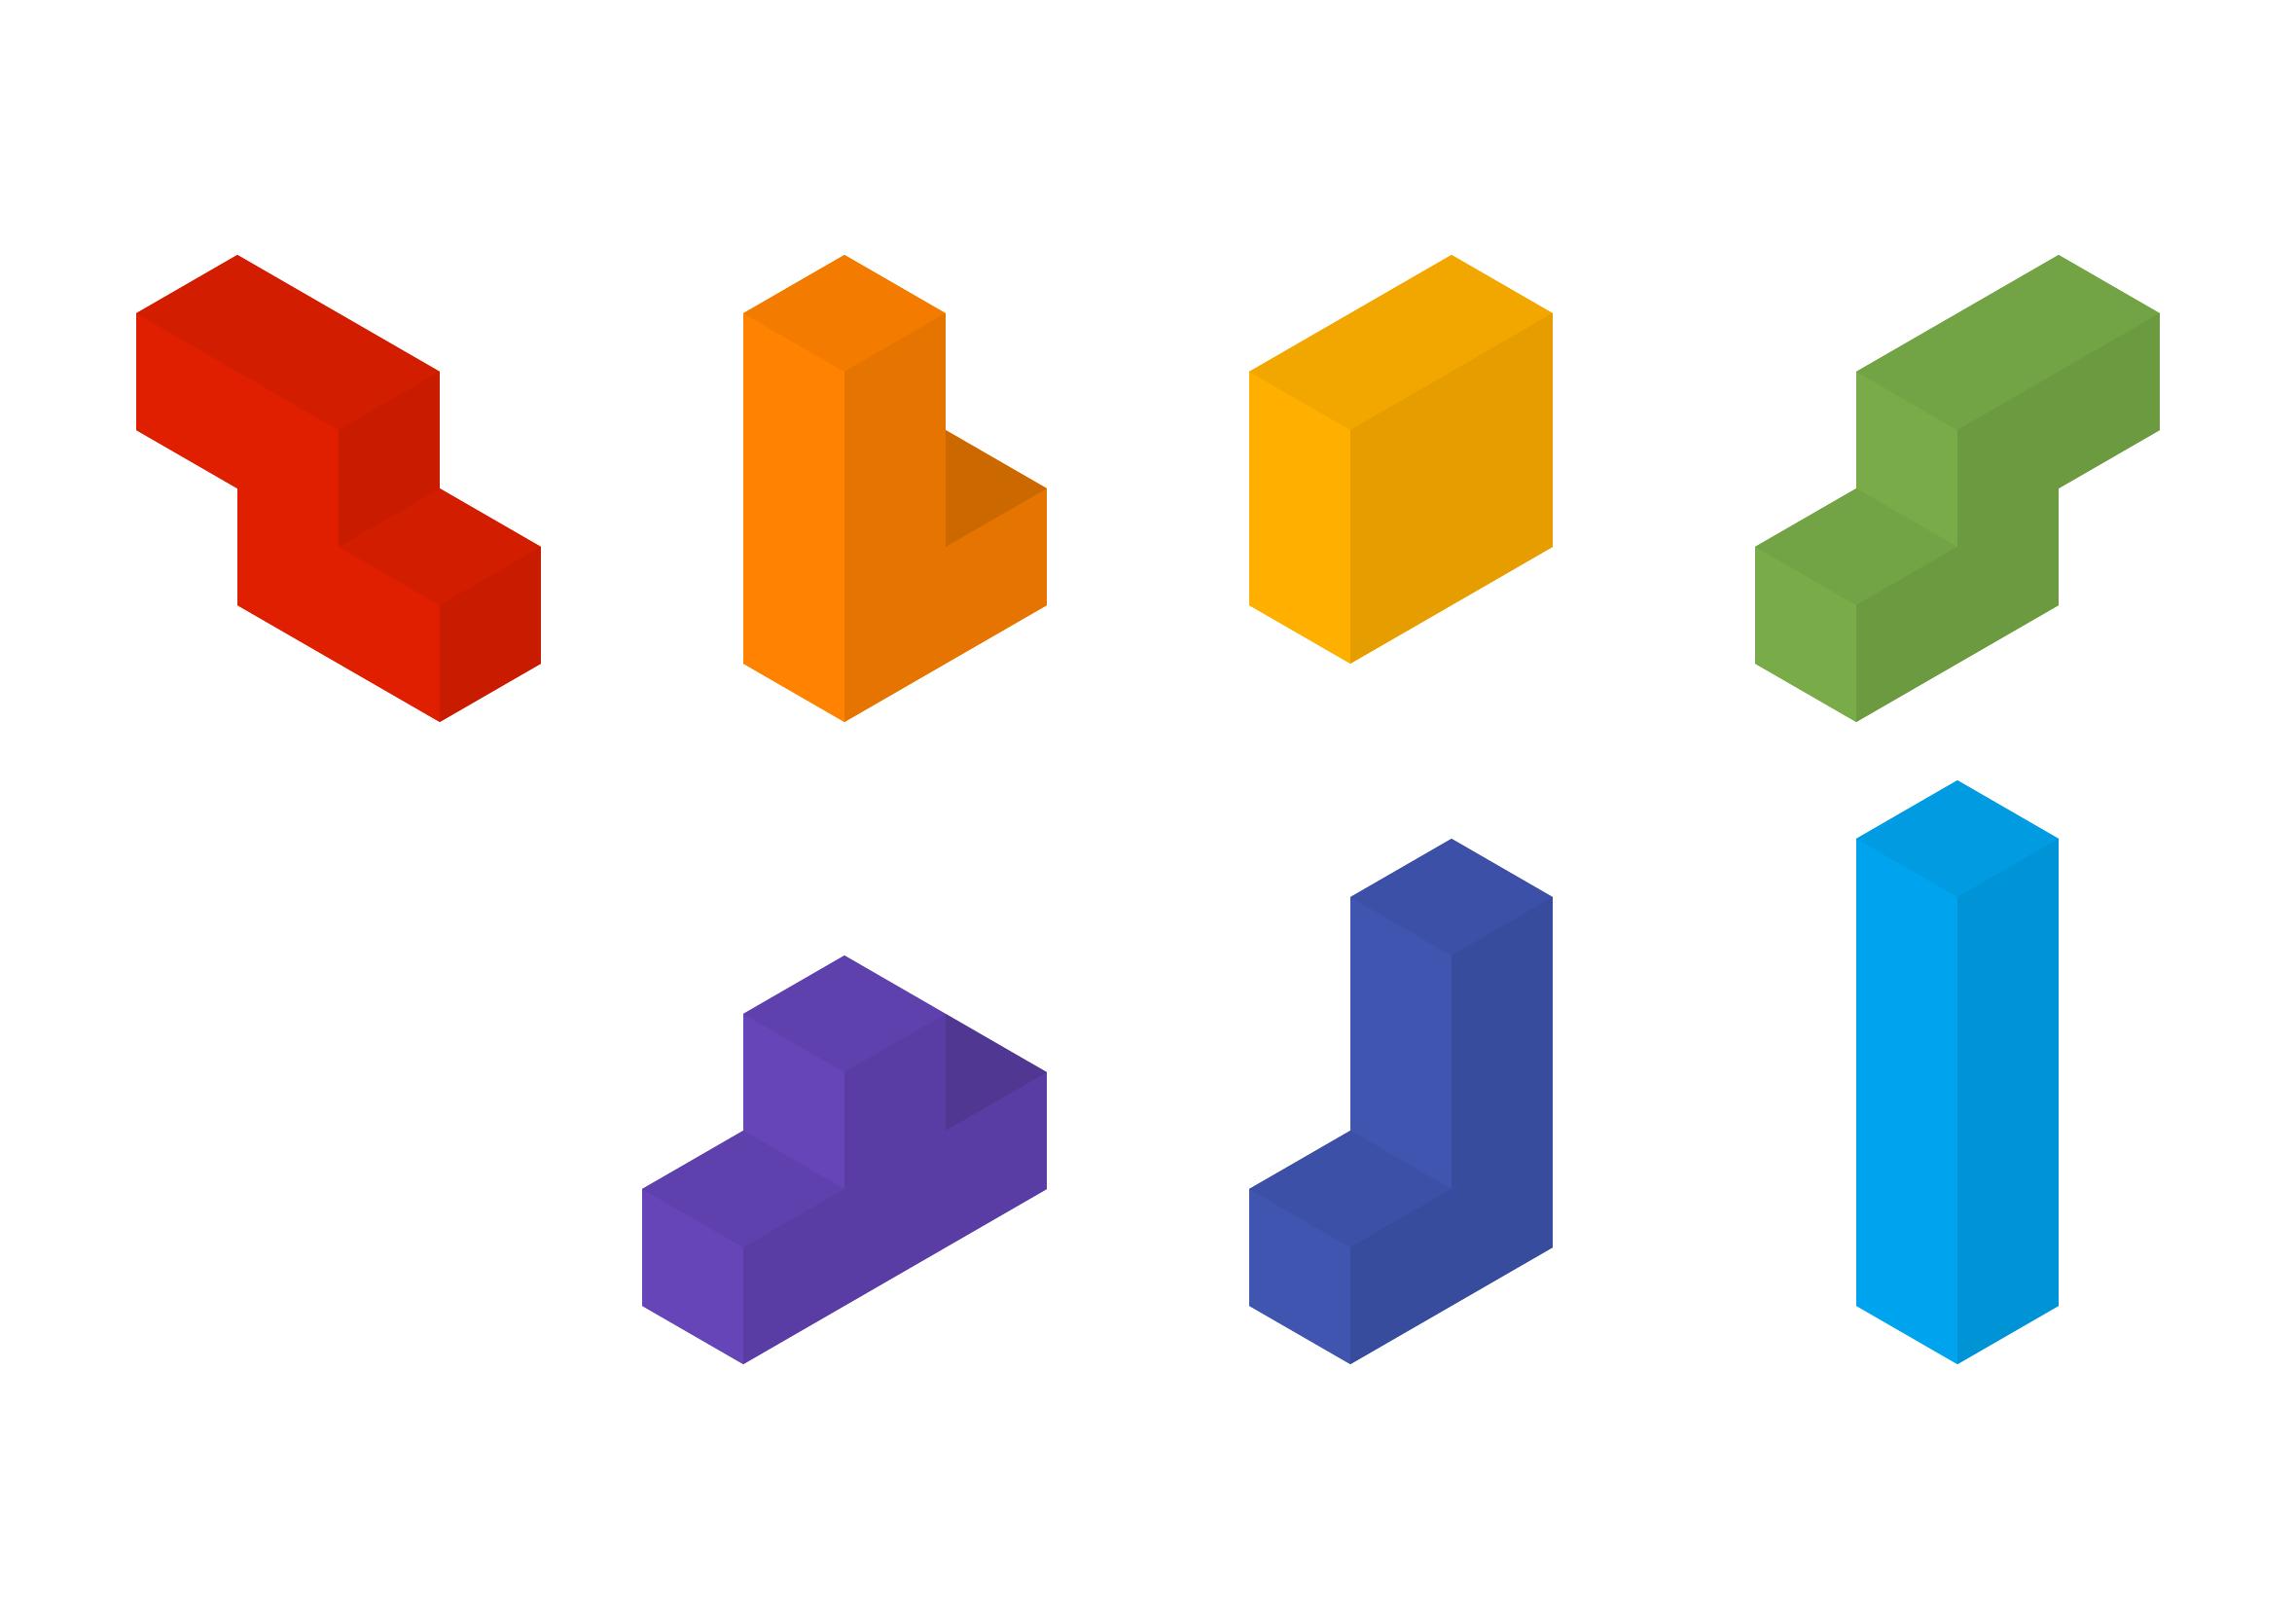 isometric-cubes-tetris-shapes